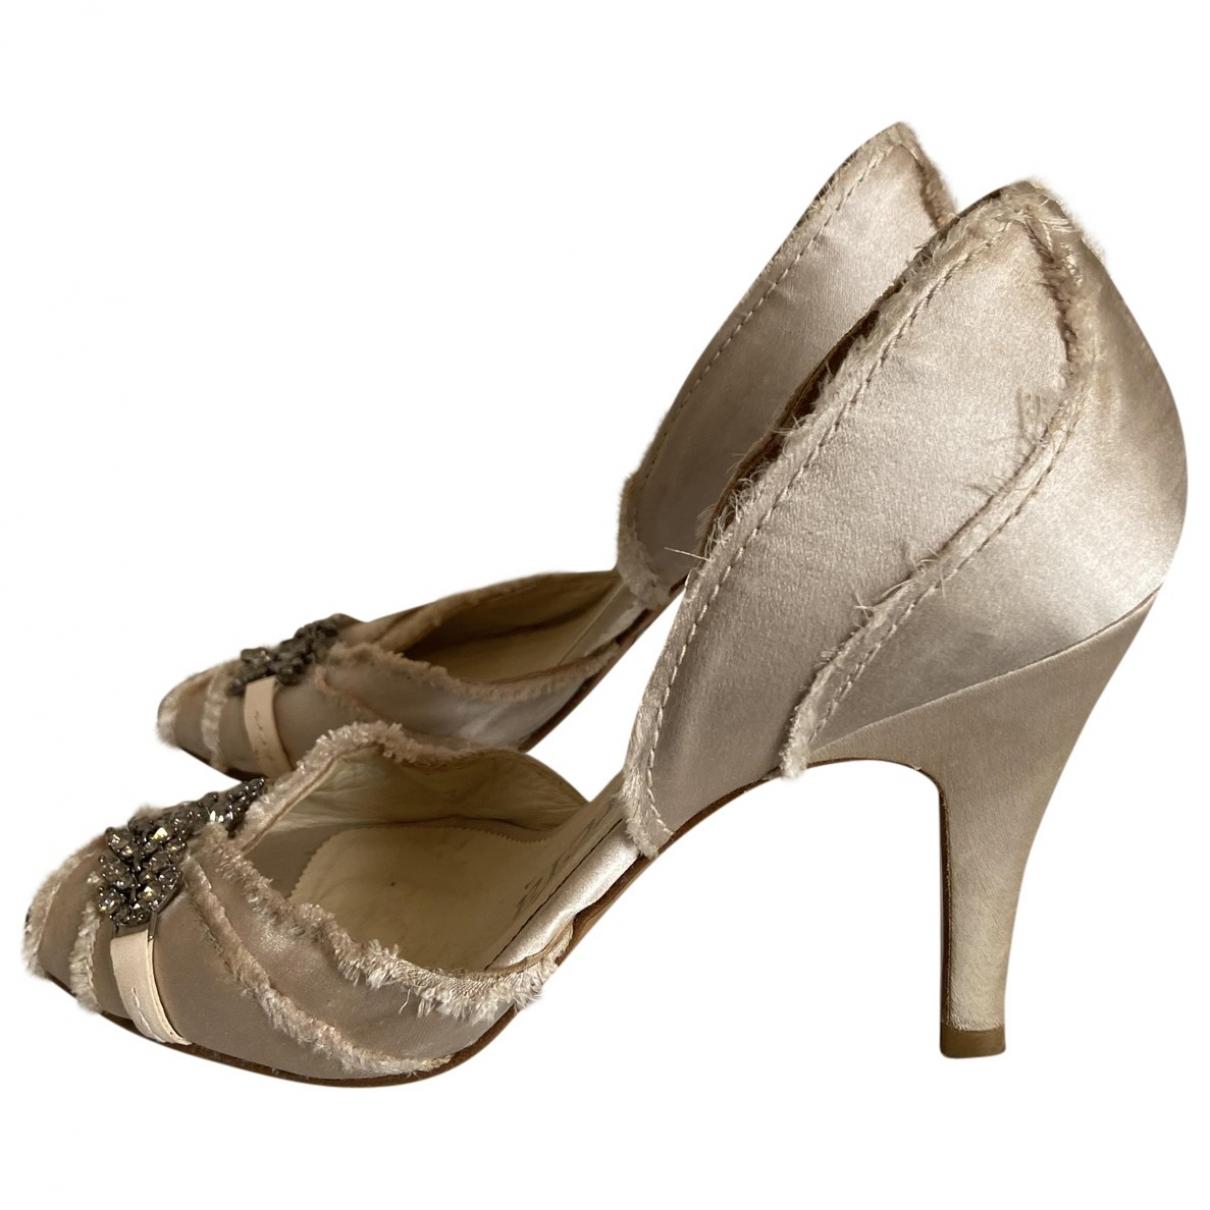 Pedro Garcia \N Beige Glitter Sandals for Women 37 EU